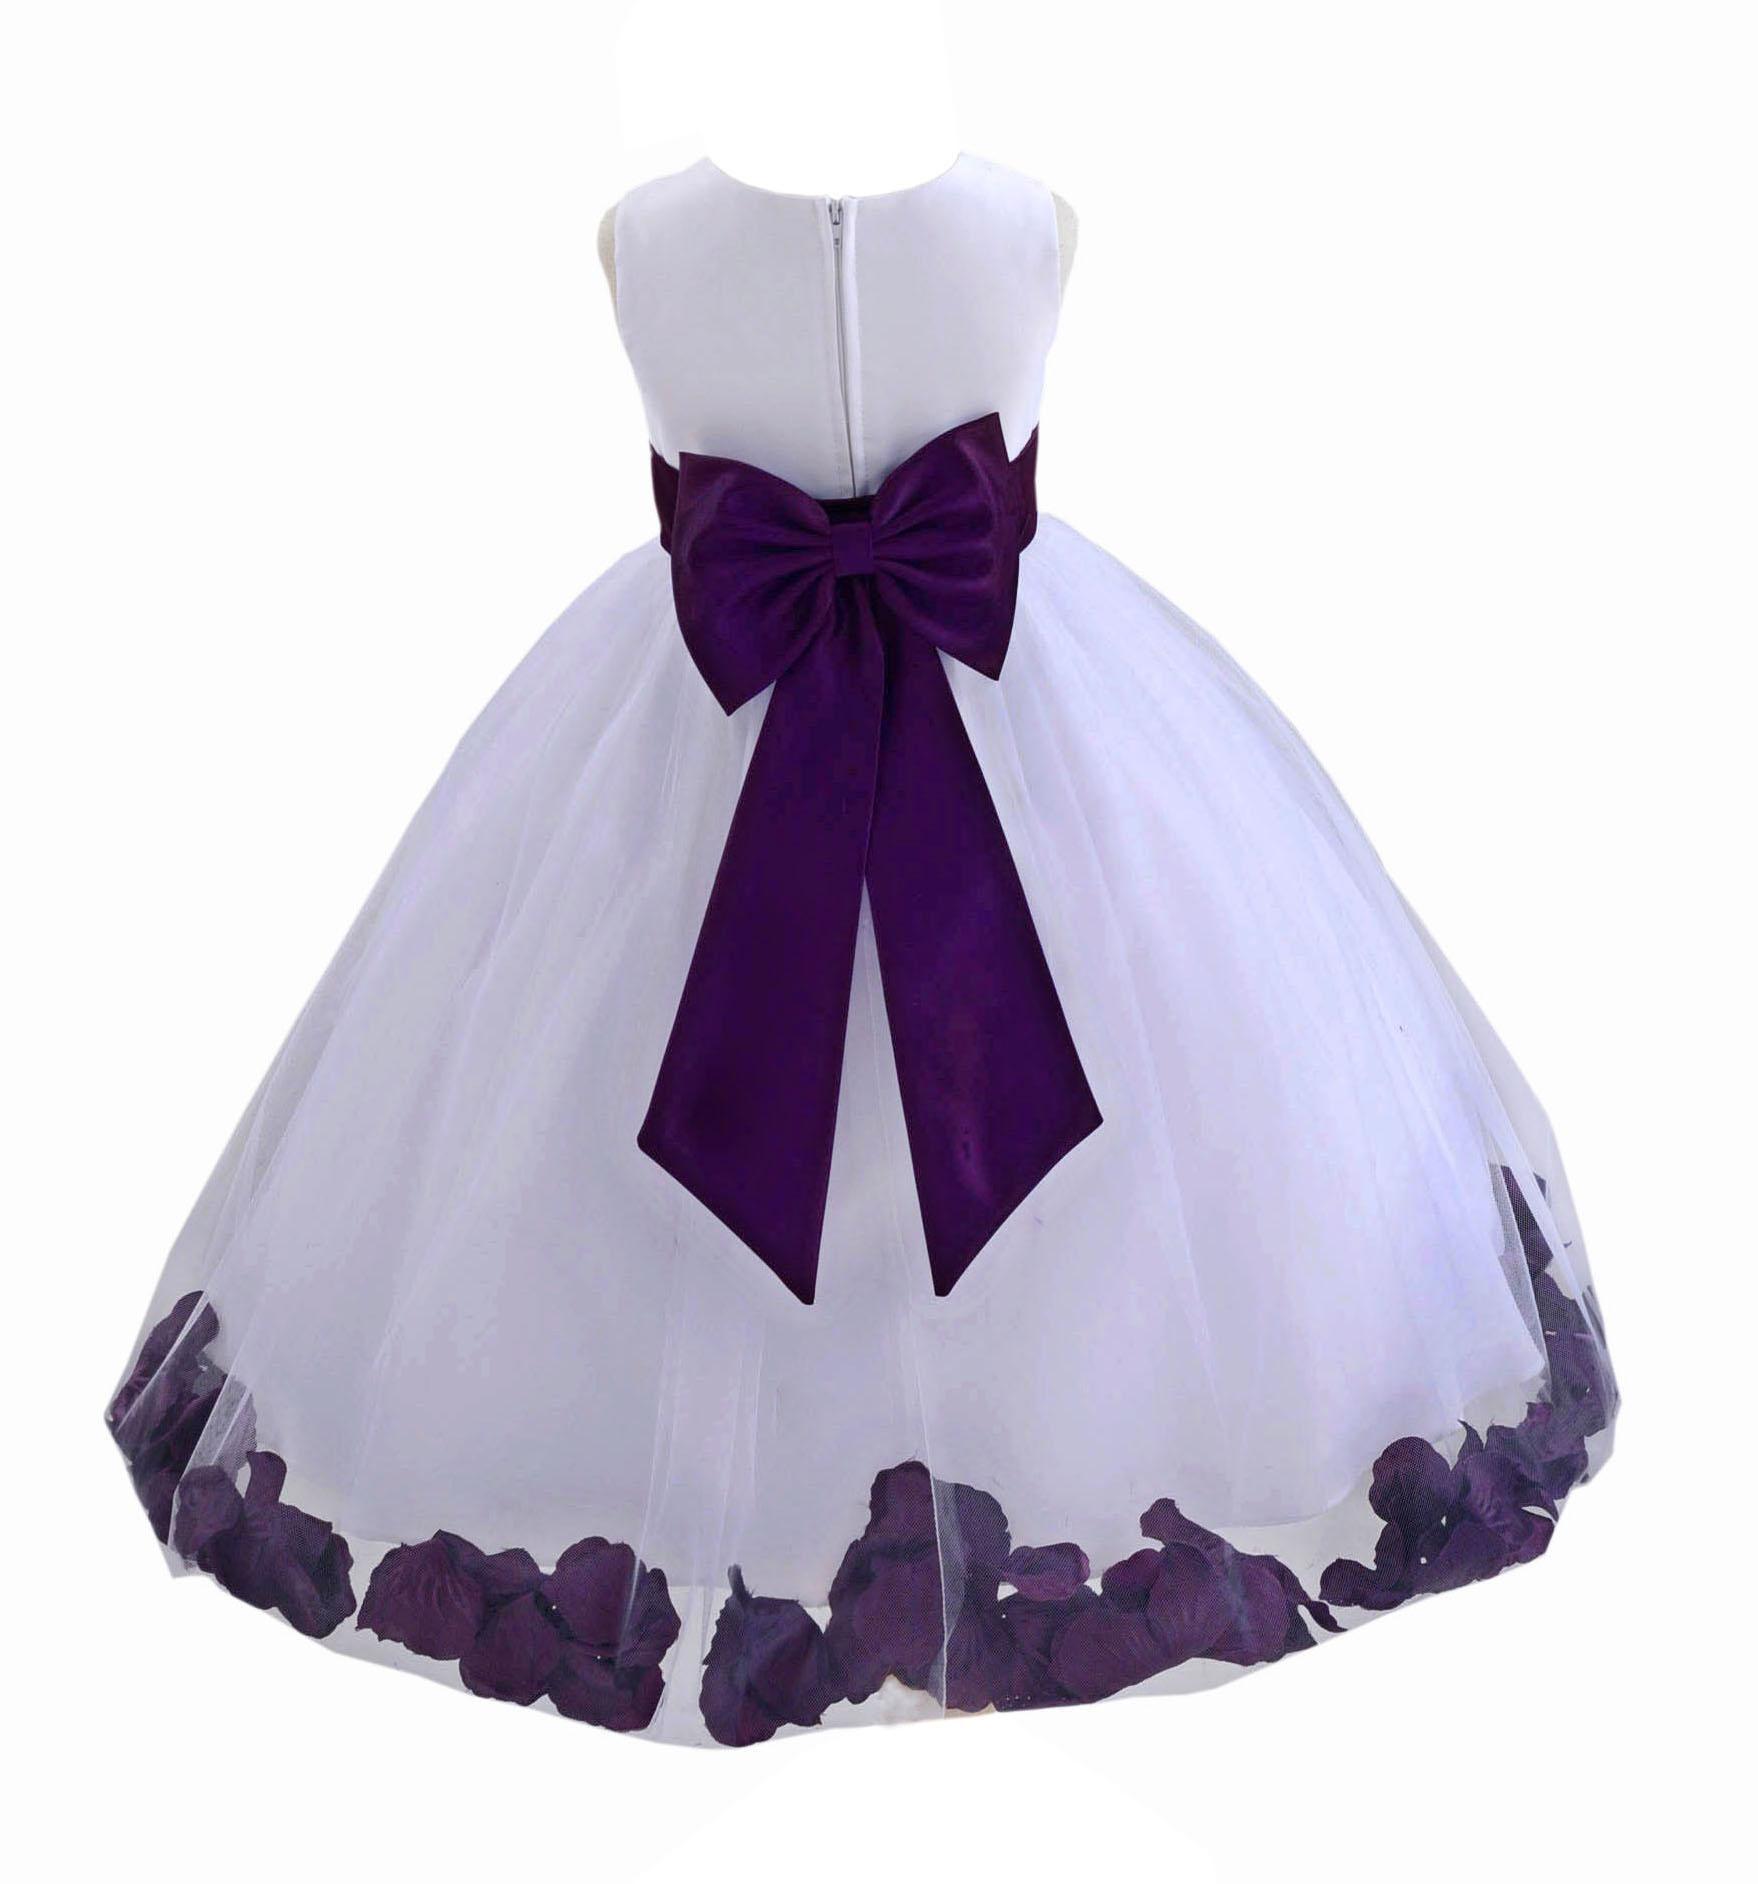 bridesmaid junior holiday dress Flower girl purple summer dress Christmas wedding gown